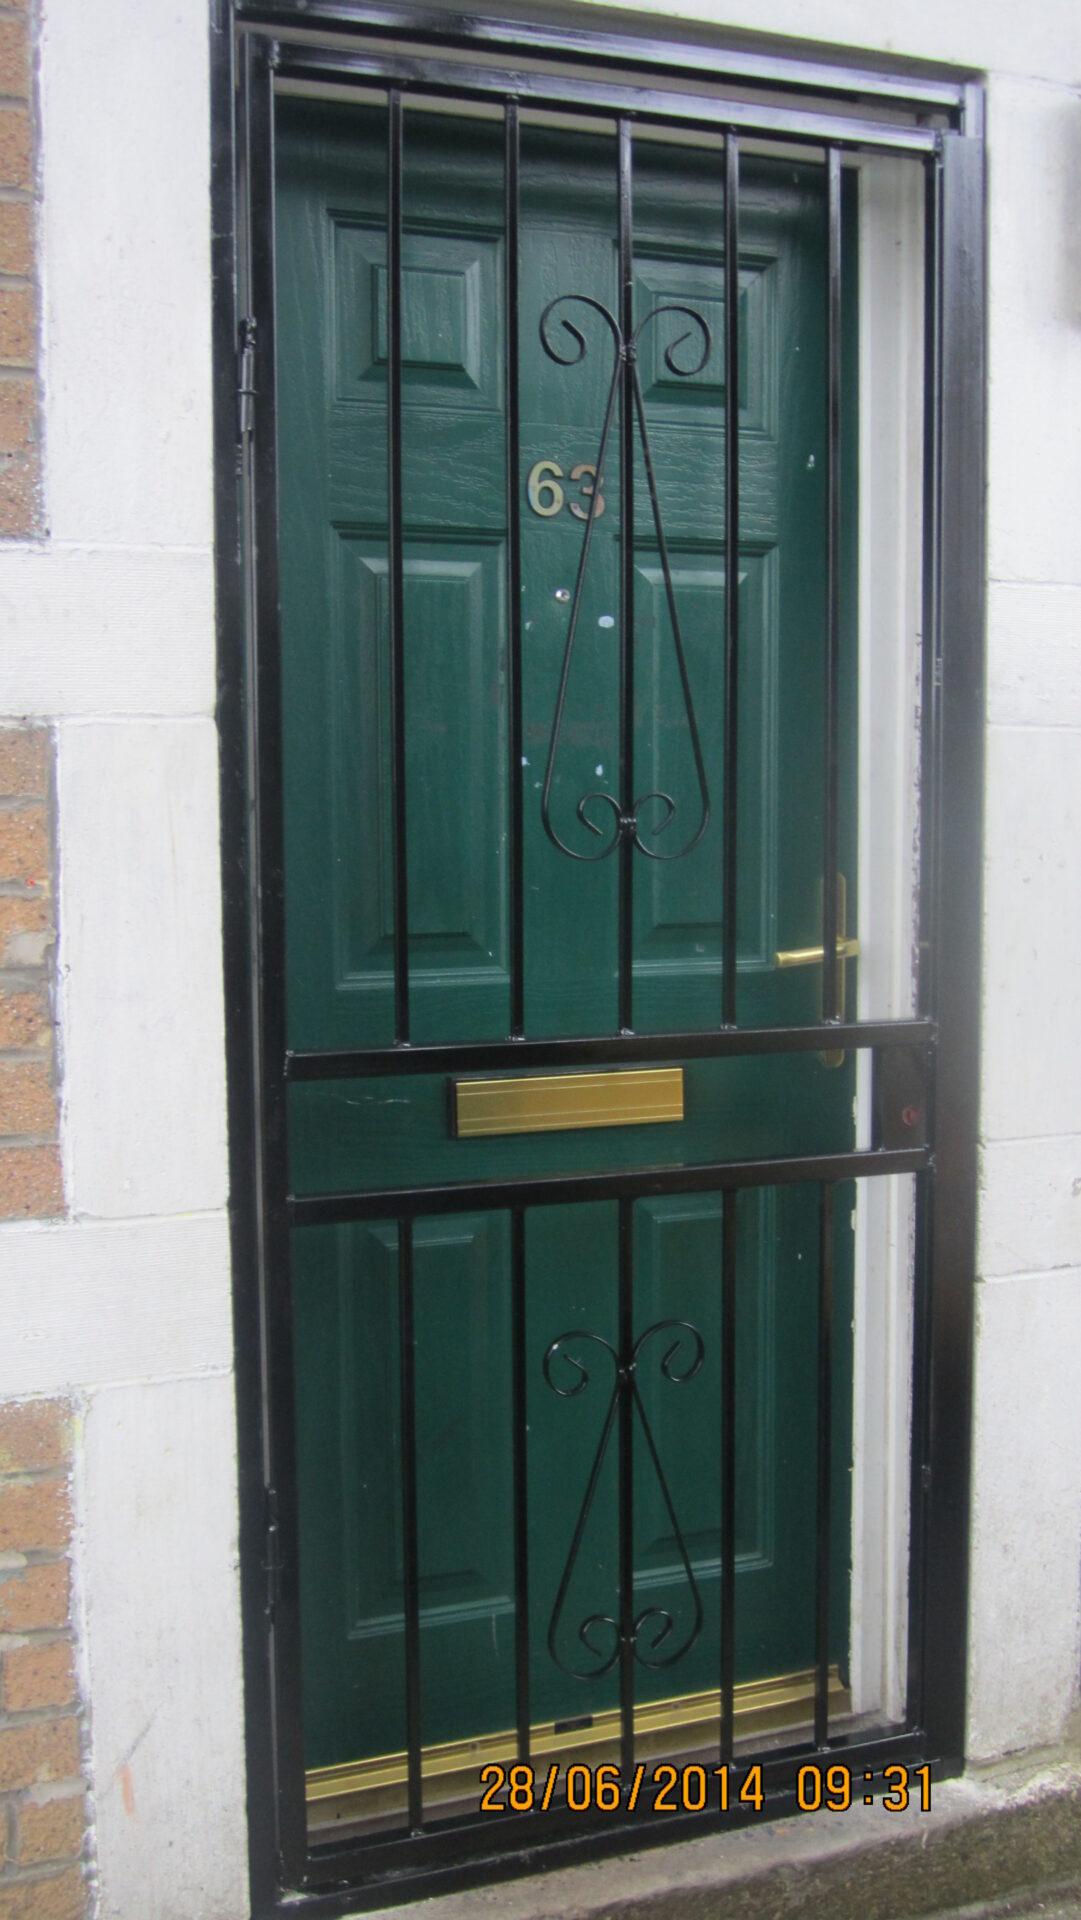 Security Grilles | Gates, Railings - dford, Leeds on